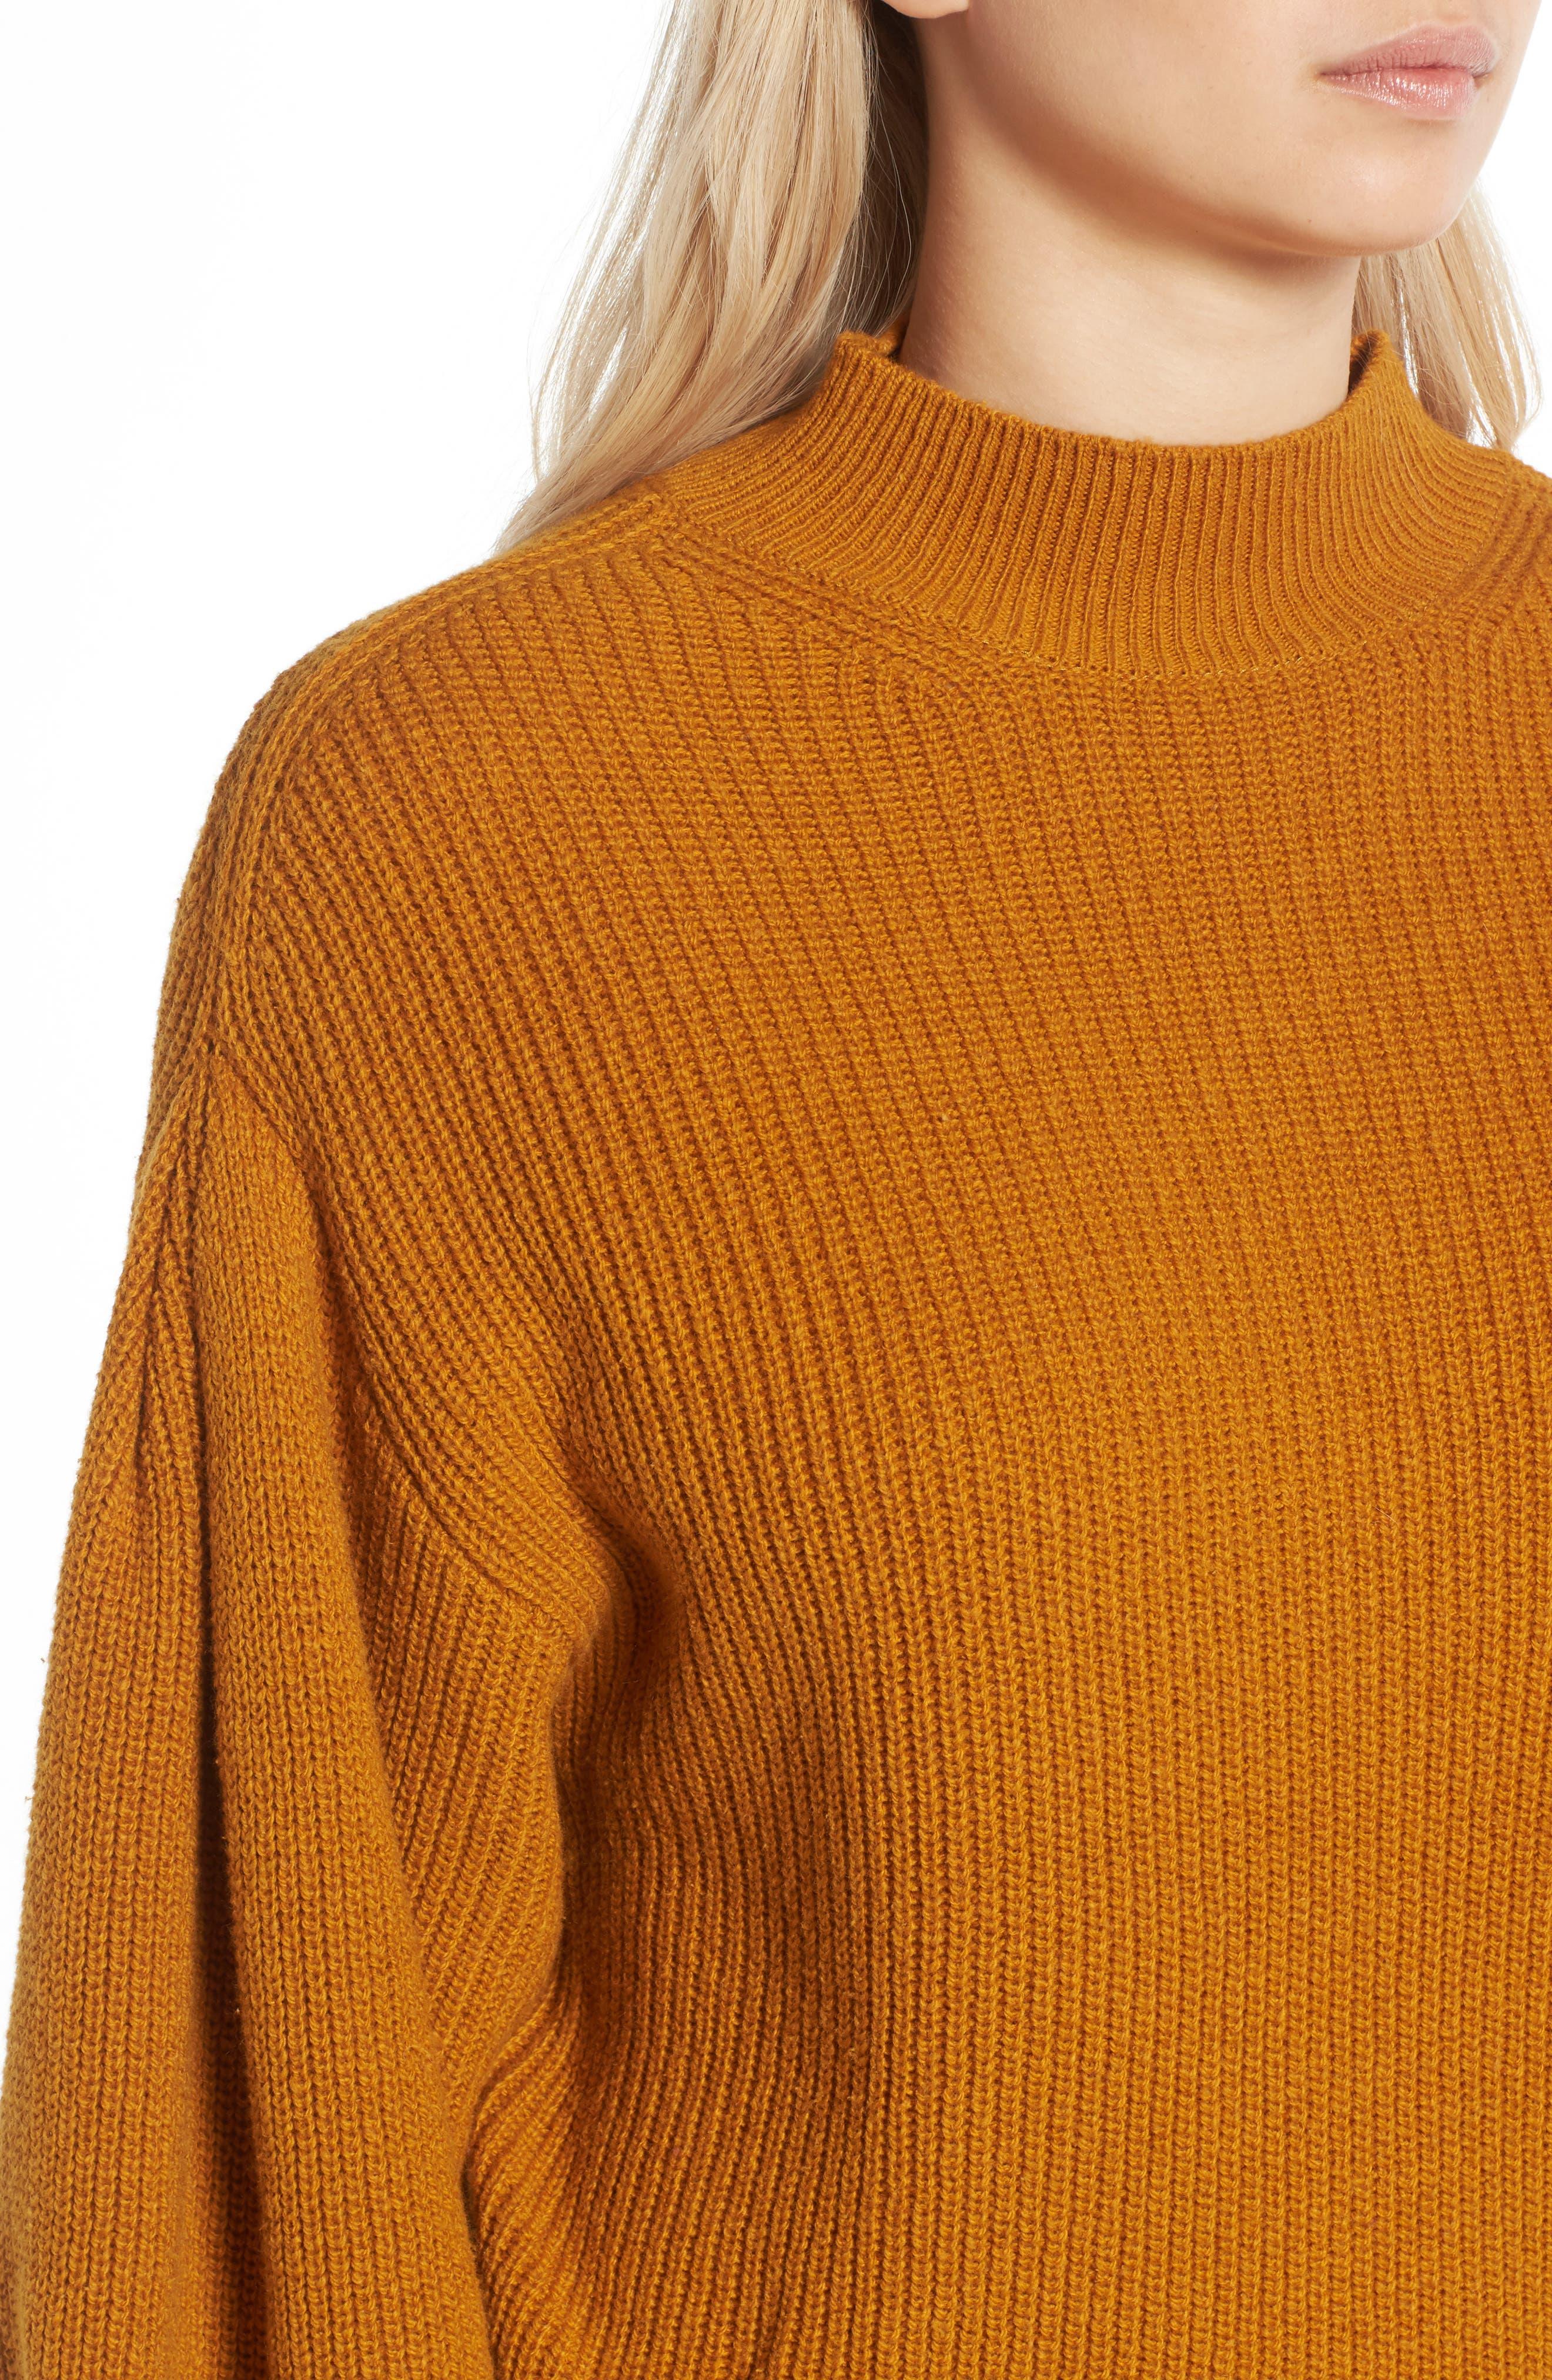 Blouson Sleeve Sweater,                             Alternate thumbnail 17, color,